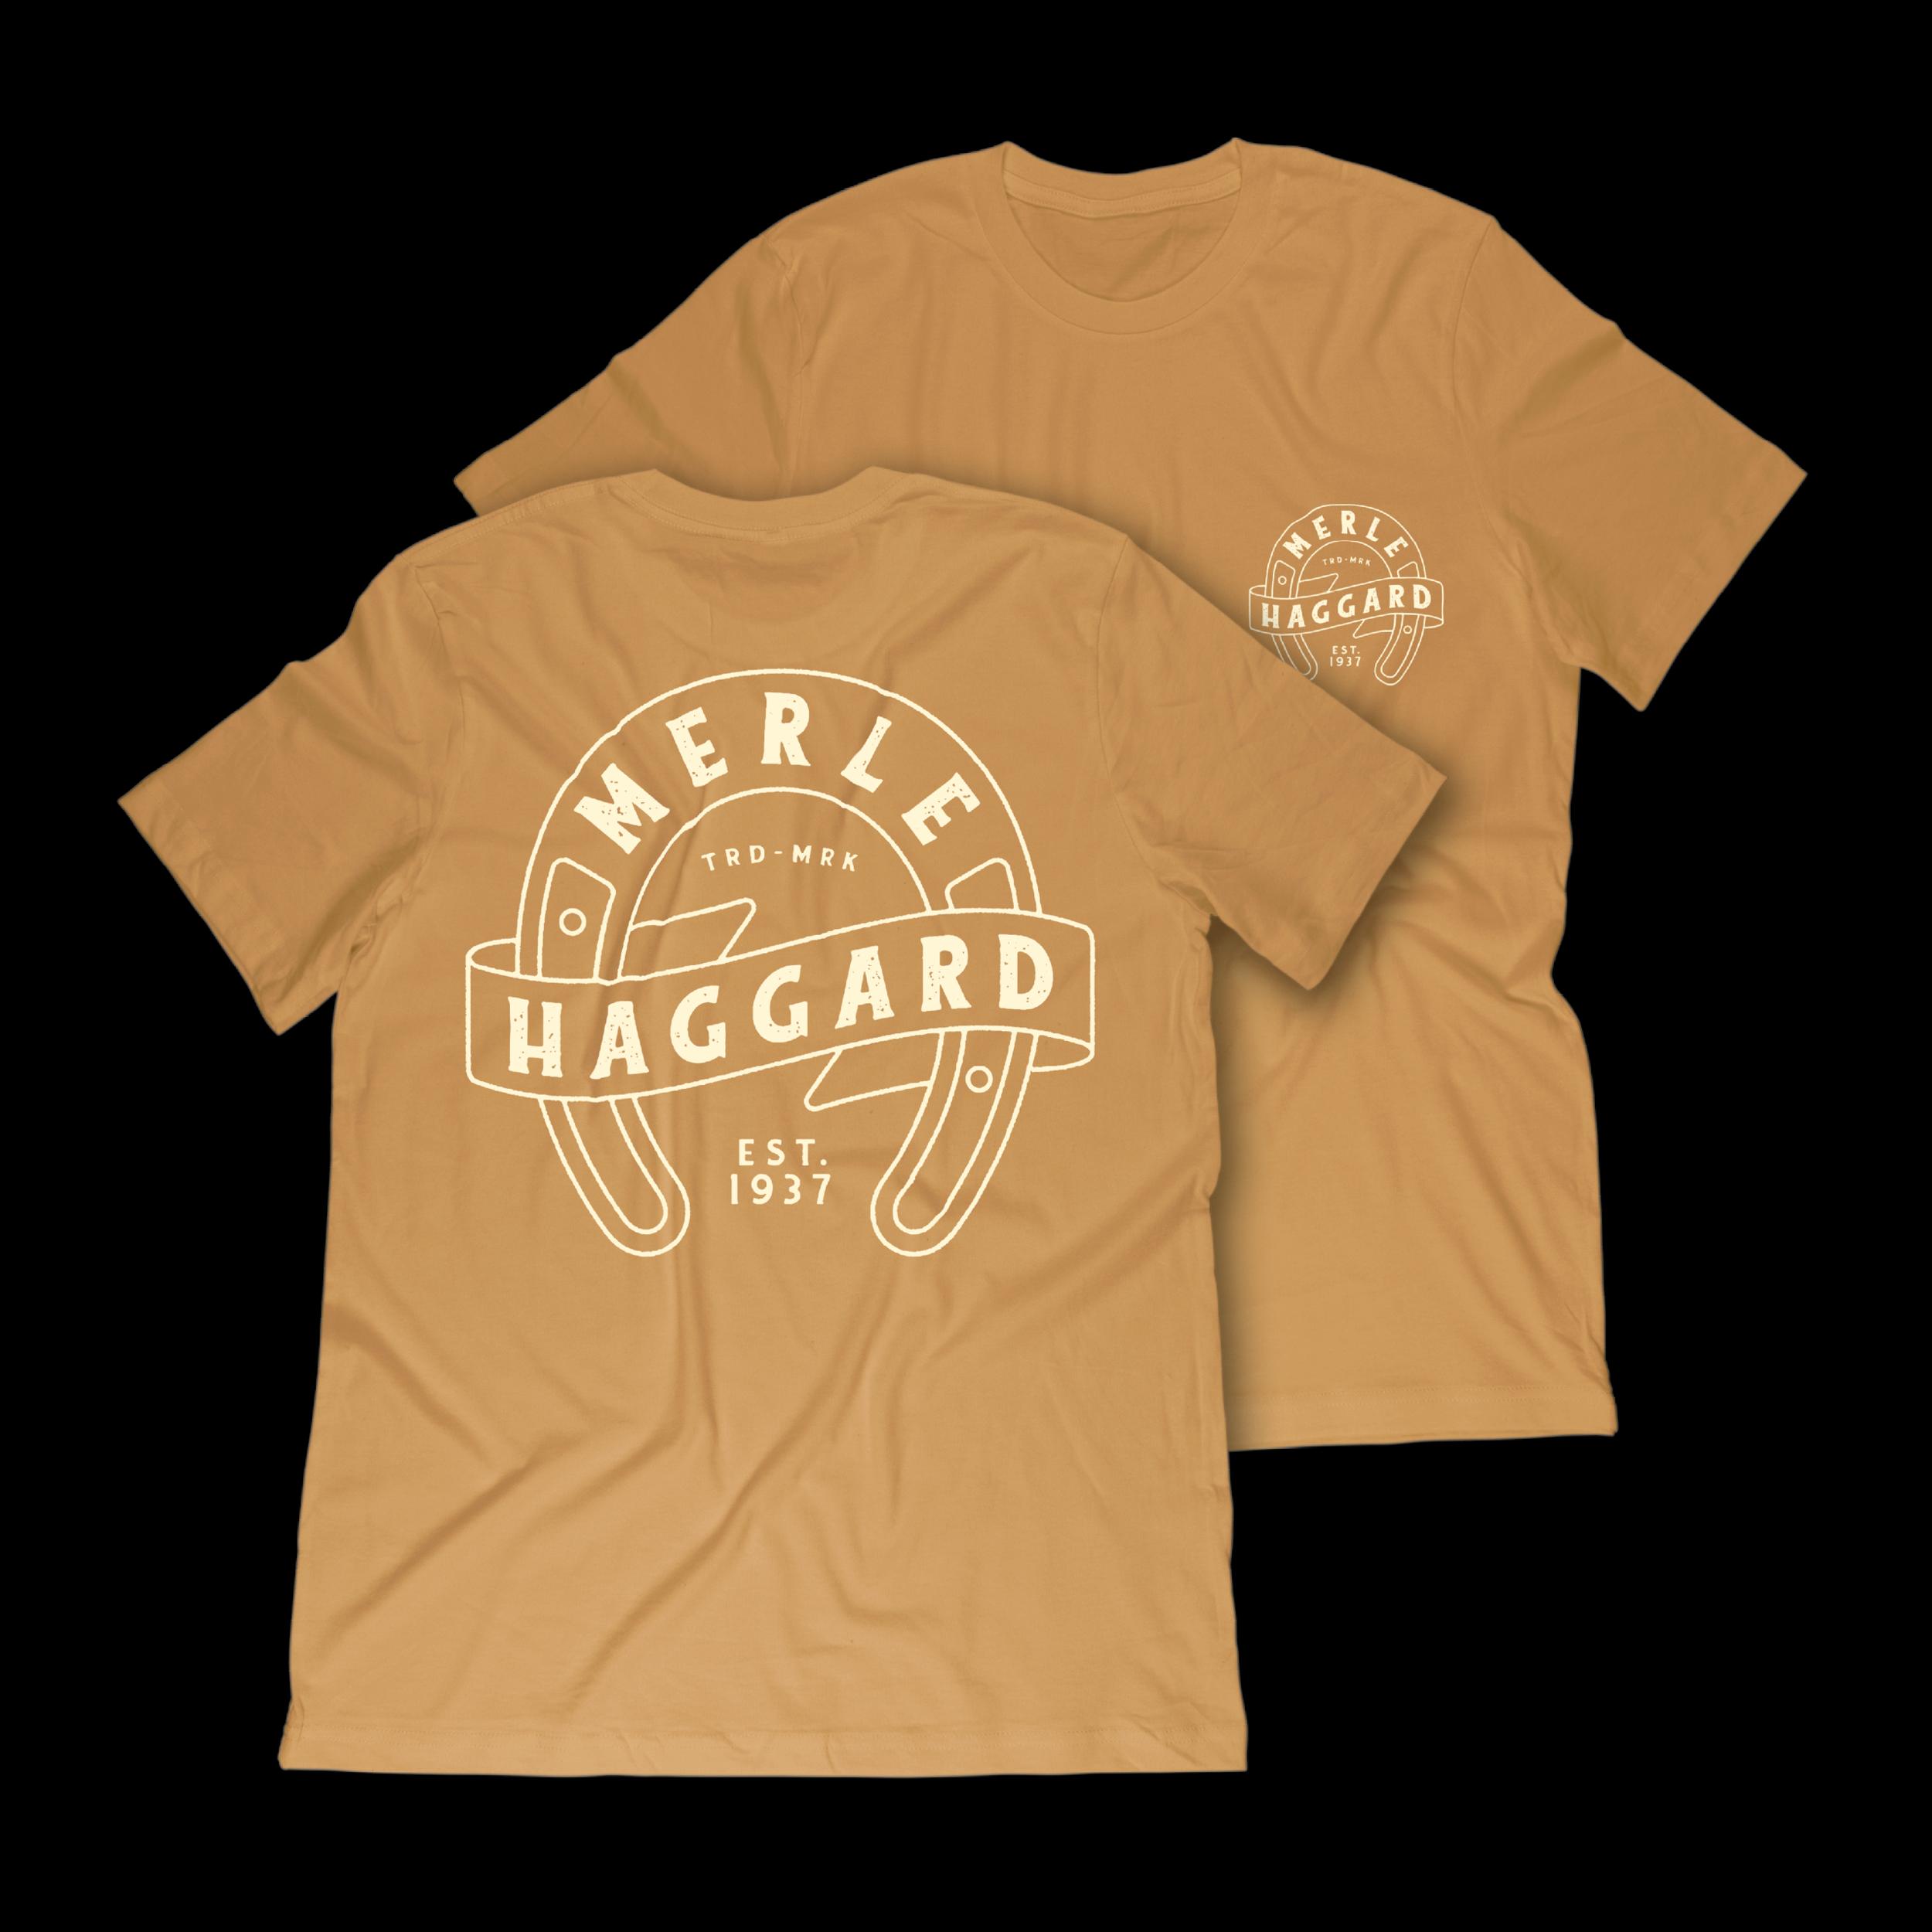 MerleHaggard-MockUps-0527195.png